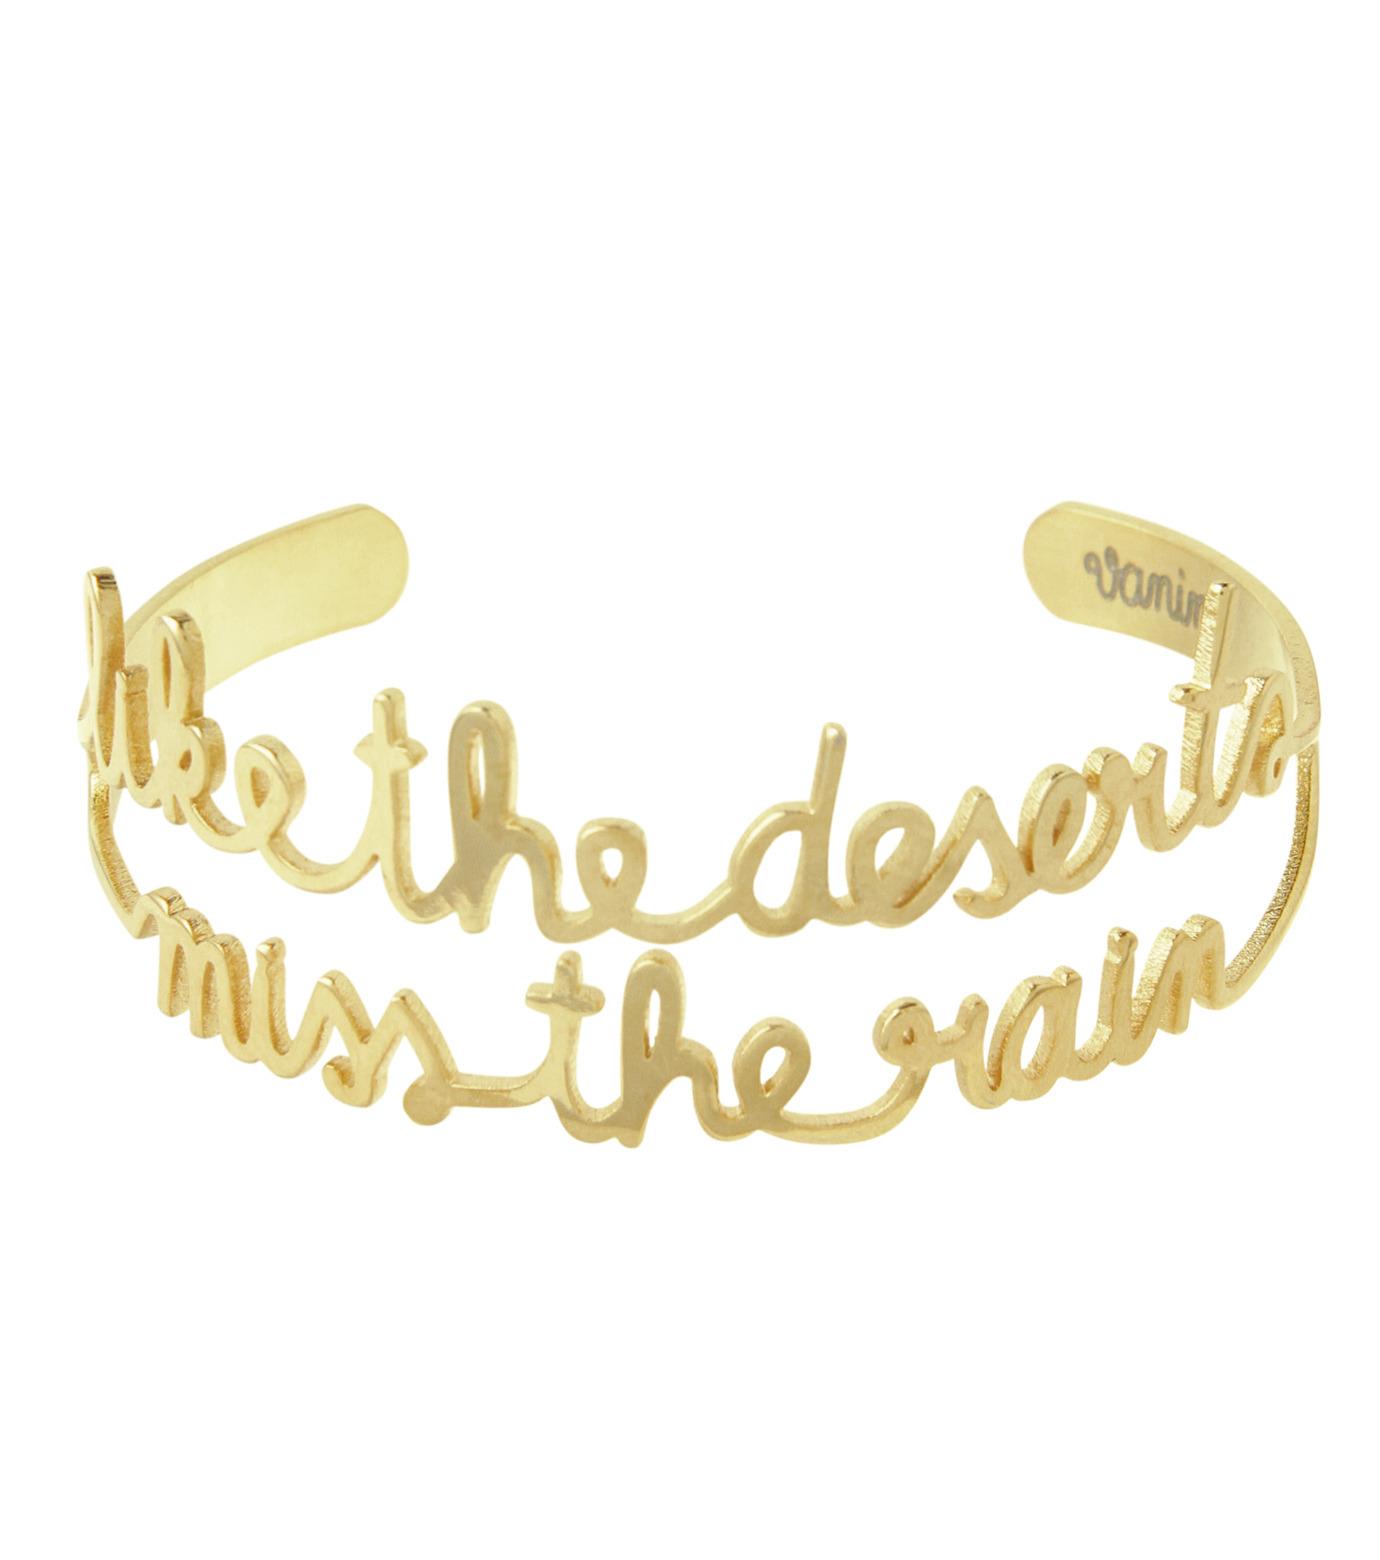 VANINA(バニーナ)のLike Deserts miss Rain Bracelet-GOLD(アクセサリー/accessory)-LIKE-Dese-L 拡大詳細画像1